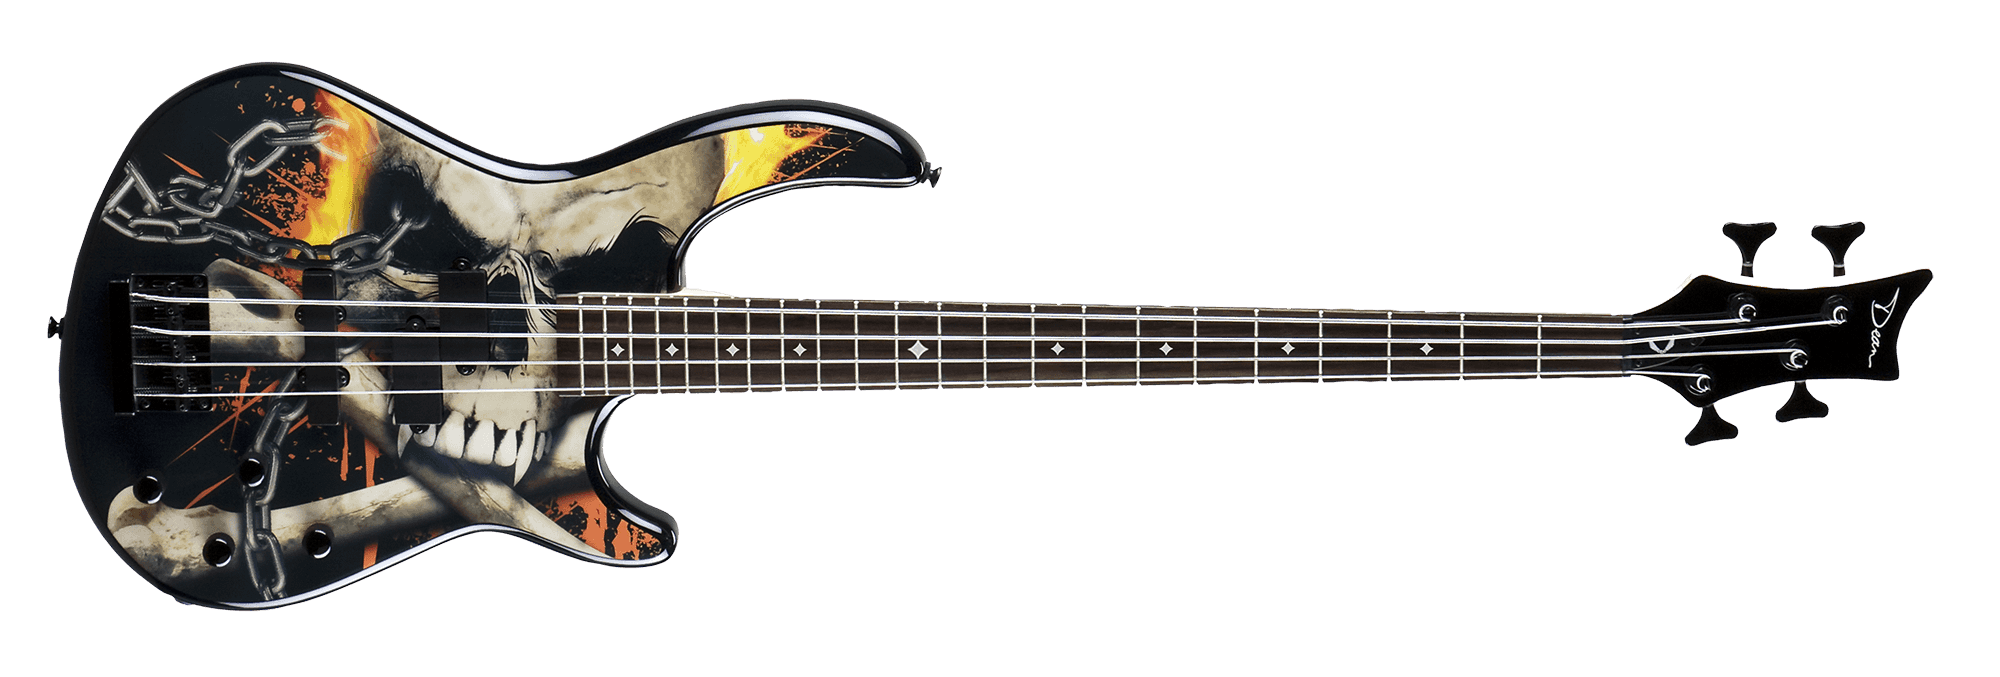 Dean Edge Bass Guitar Wiring Diagrams - Example Electrical Wiring ...